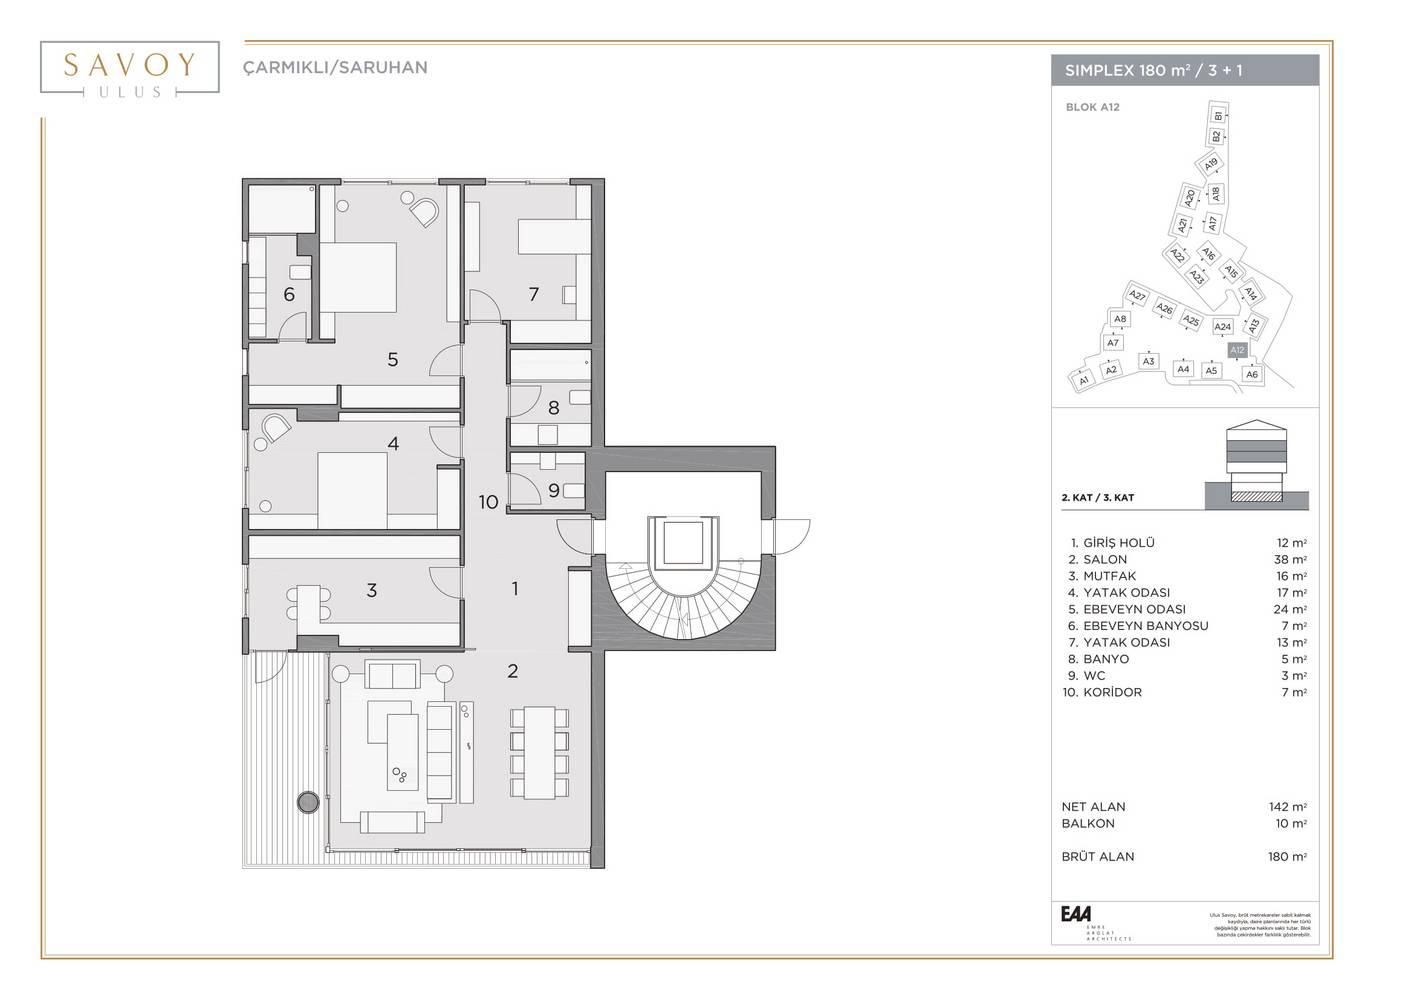 Savoy Residence S180